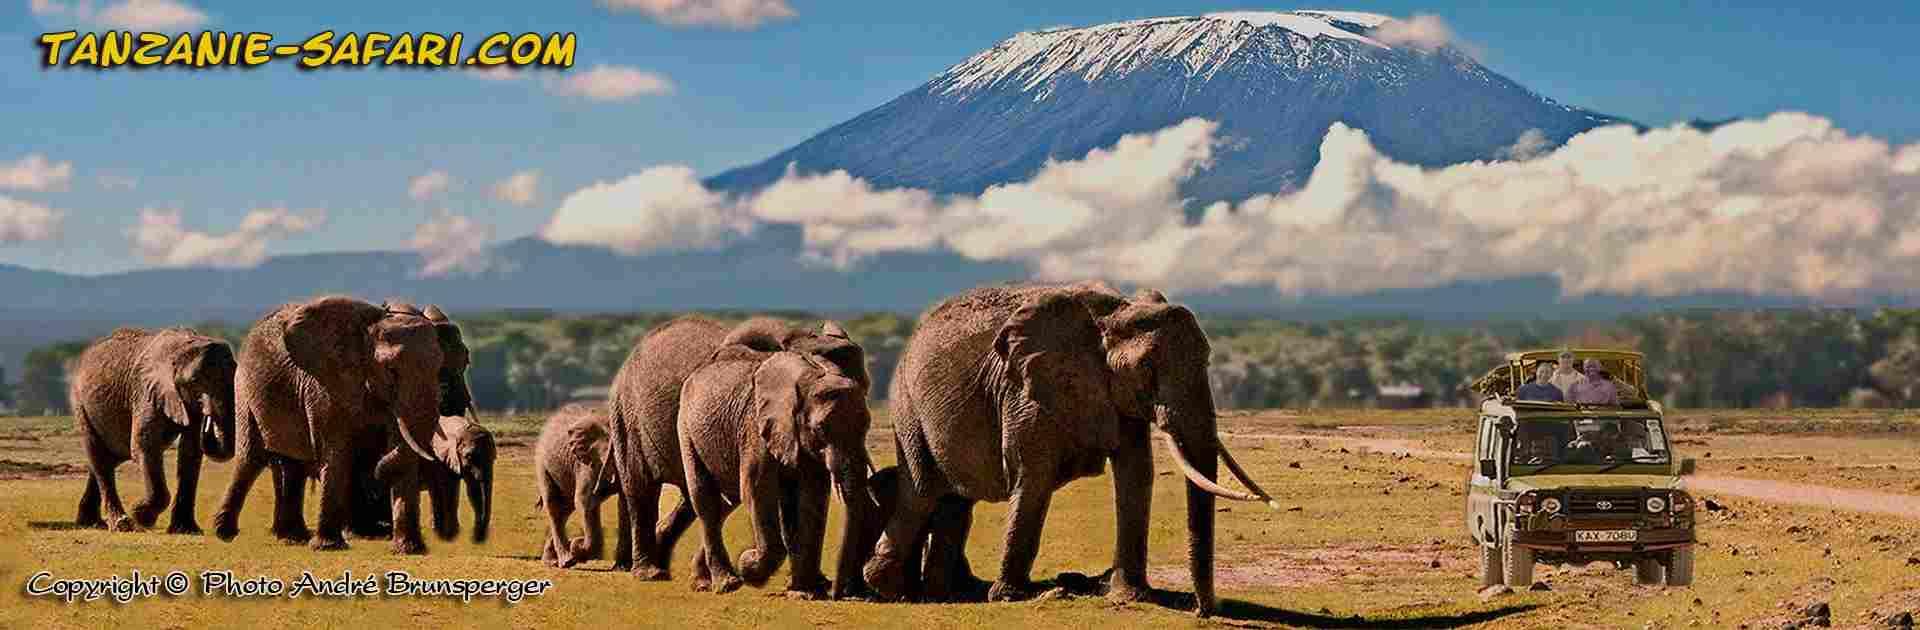 Voyage Tanzanie. Eléphants devant le mont Kilimandjaro le soir Tanzanie